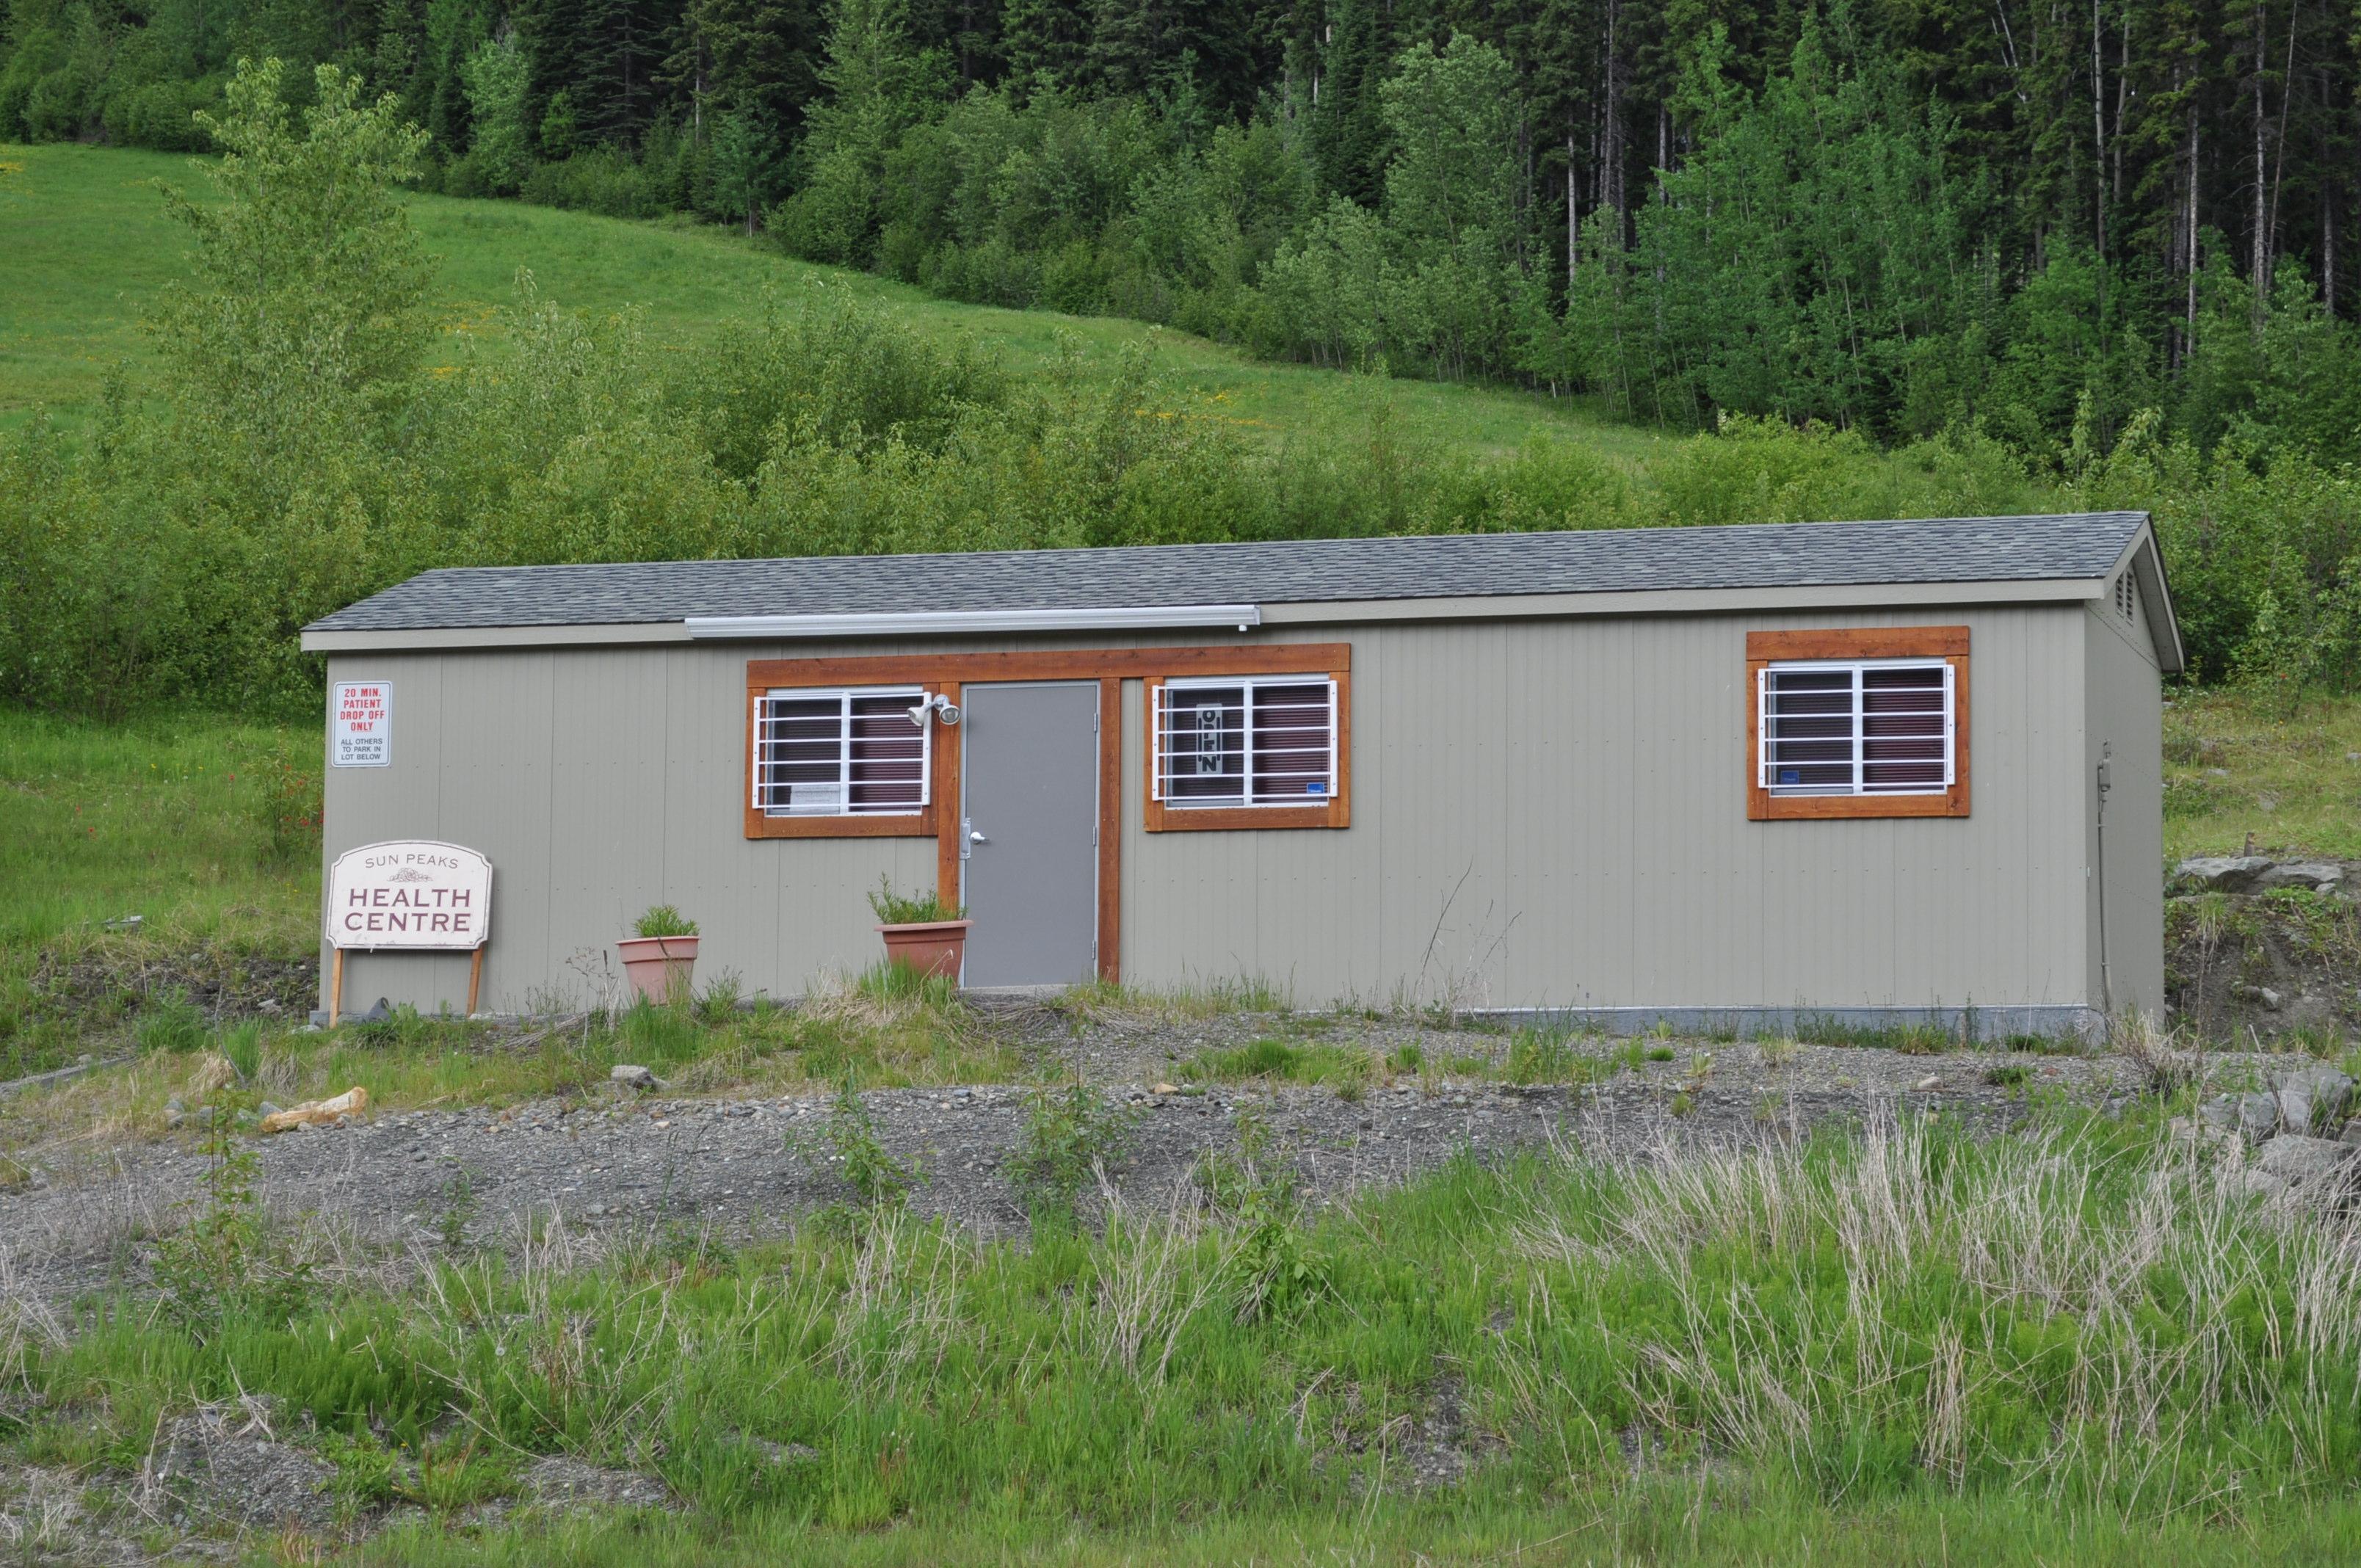 File Photo - Current Sun Peaks Health Centre